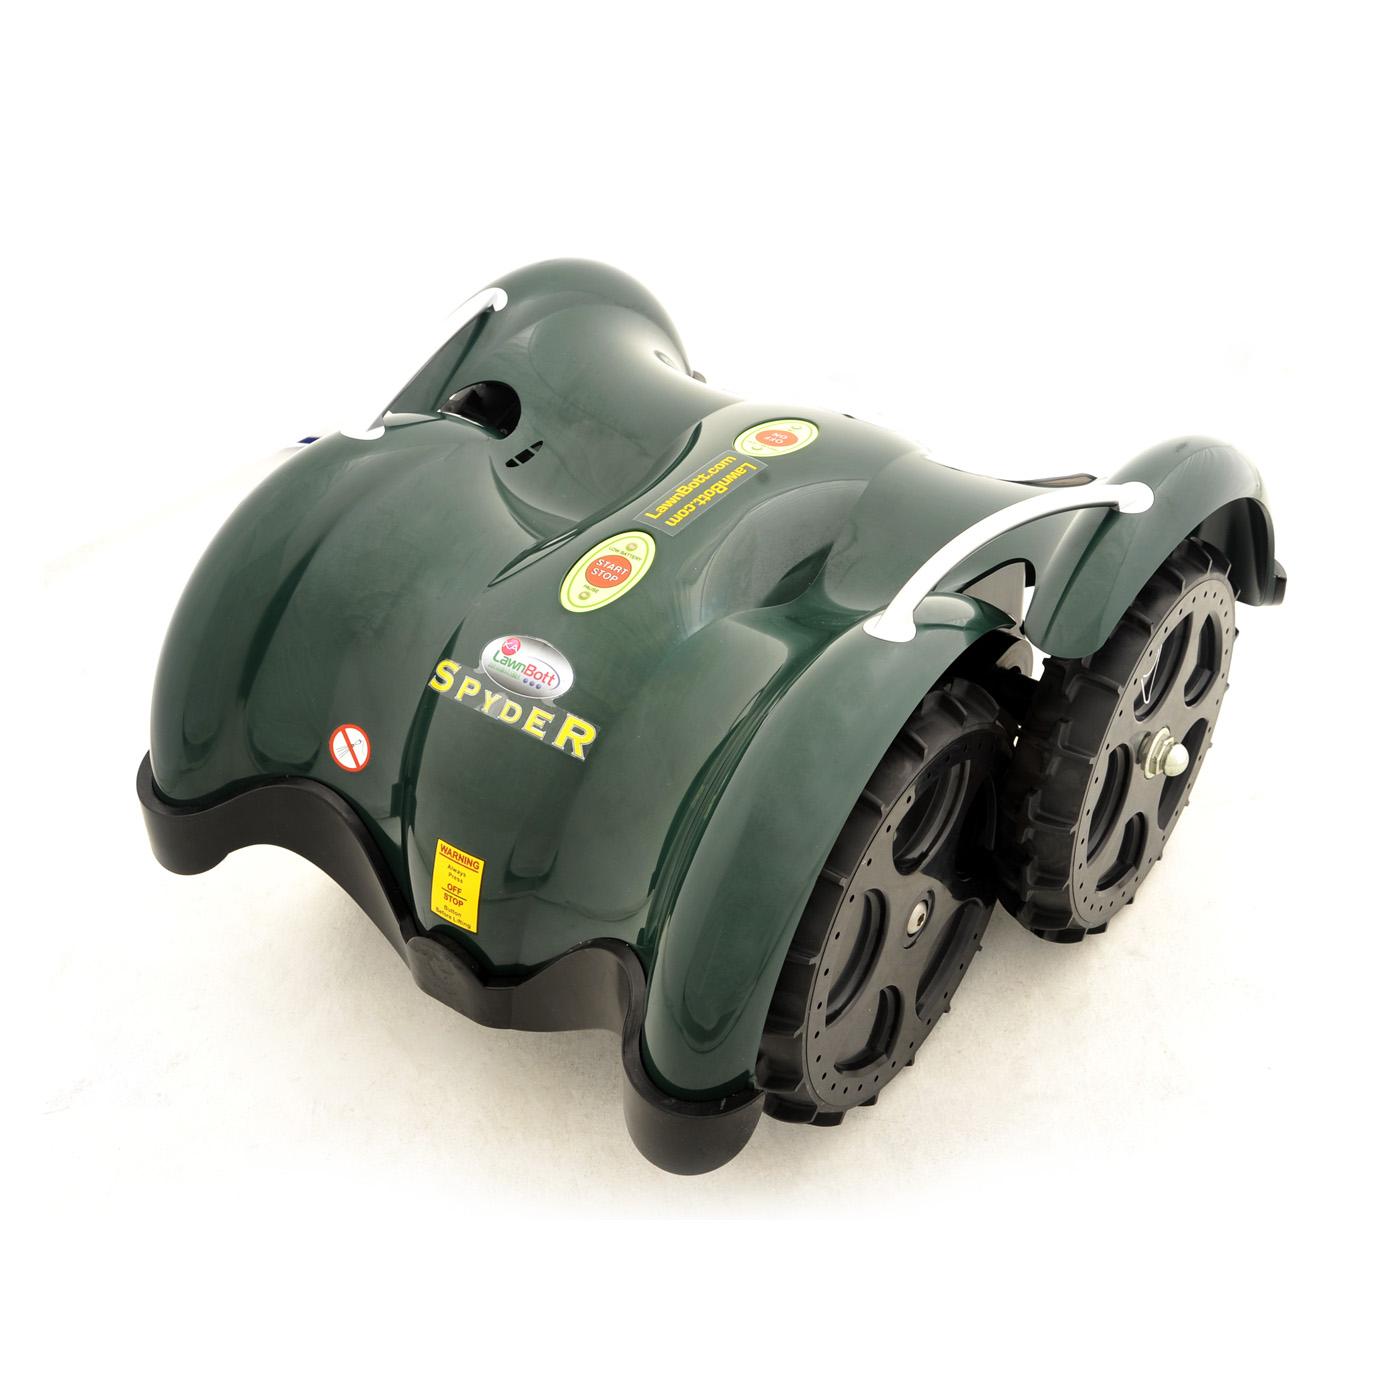 LawnBott LB1200 LawnBott Spyder Robotic Lawn Mower | ATG ...